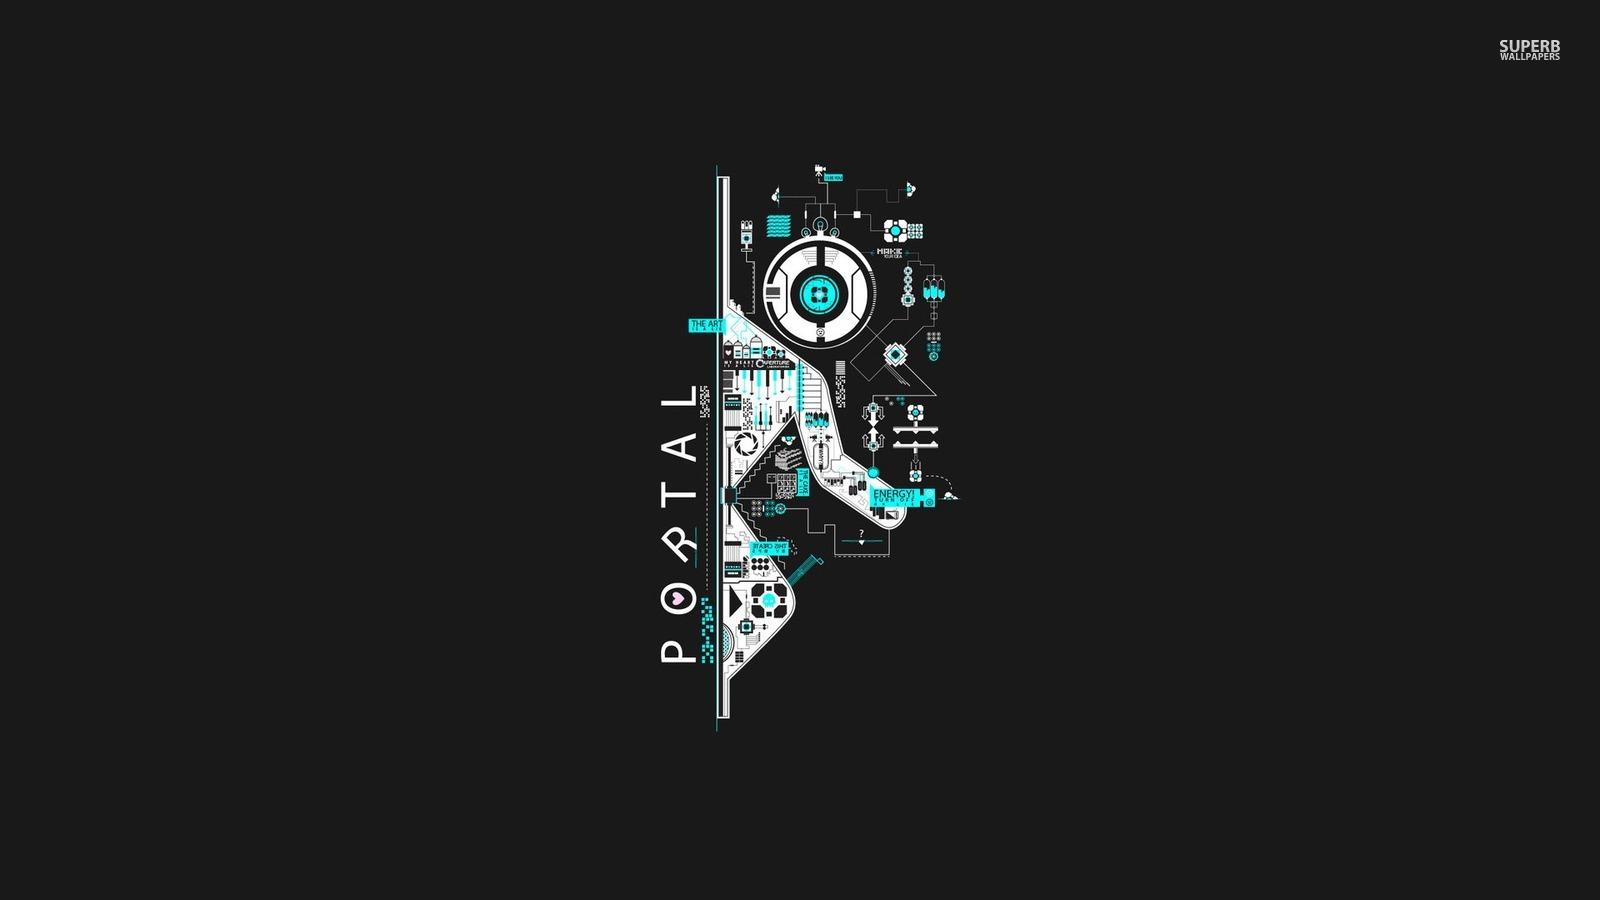 Portal Portal The Game Wallpaper 38672956 Fanpop